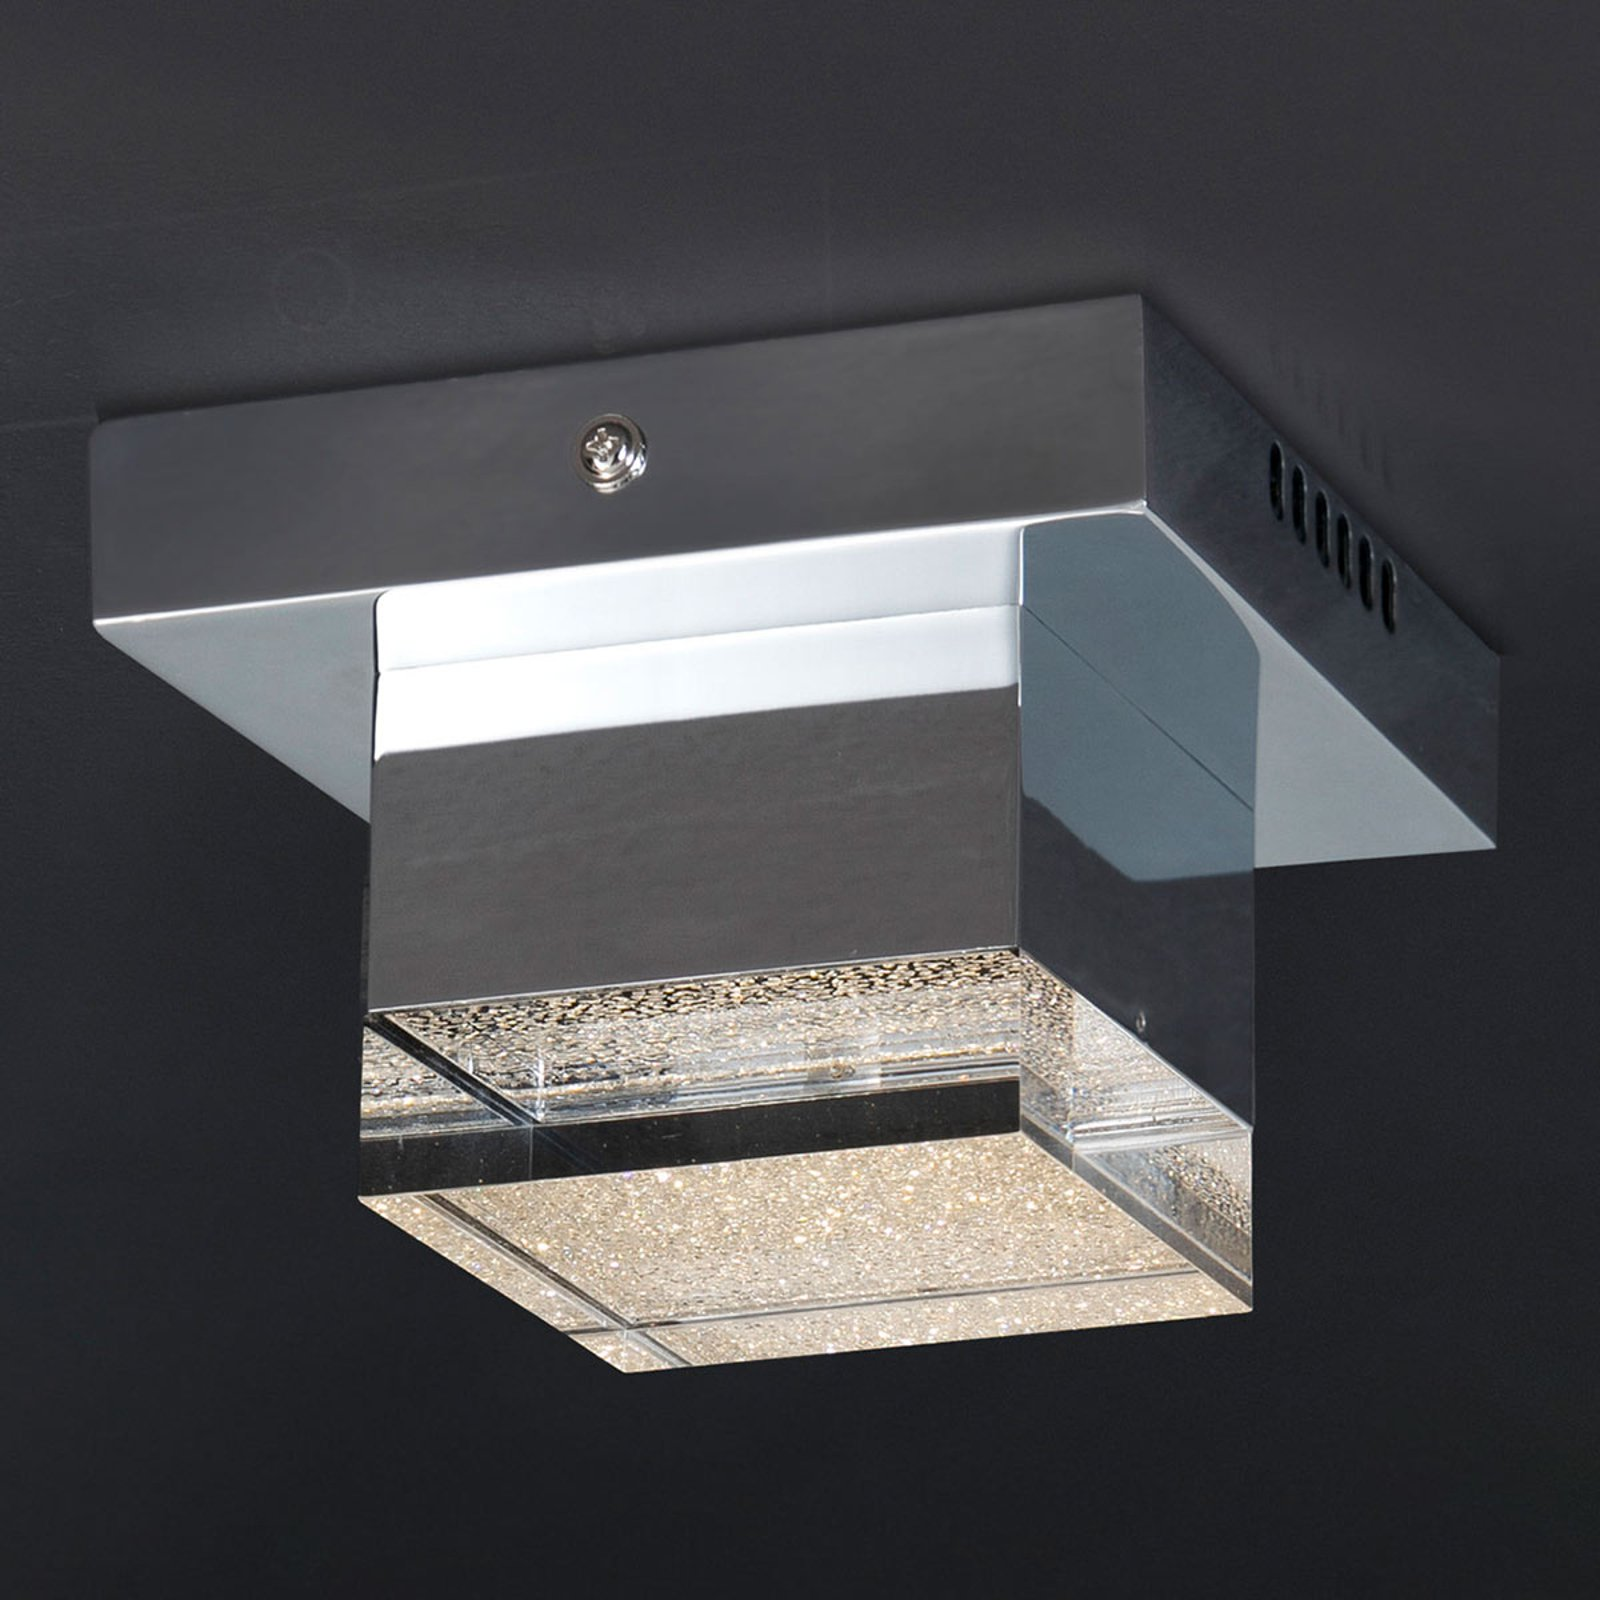 LED-taklampe Prisma, 1 lyskilde